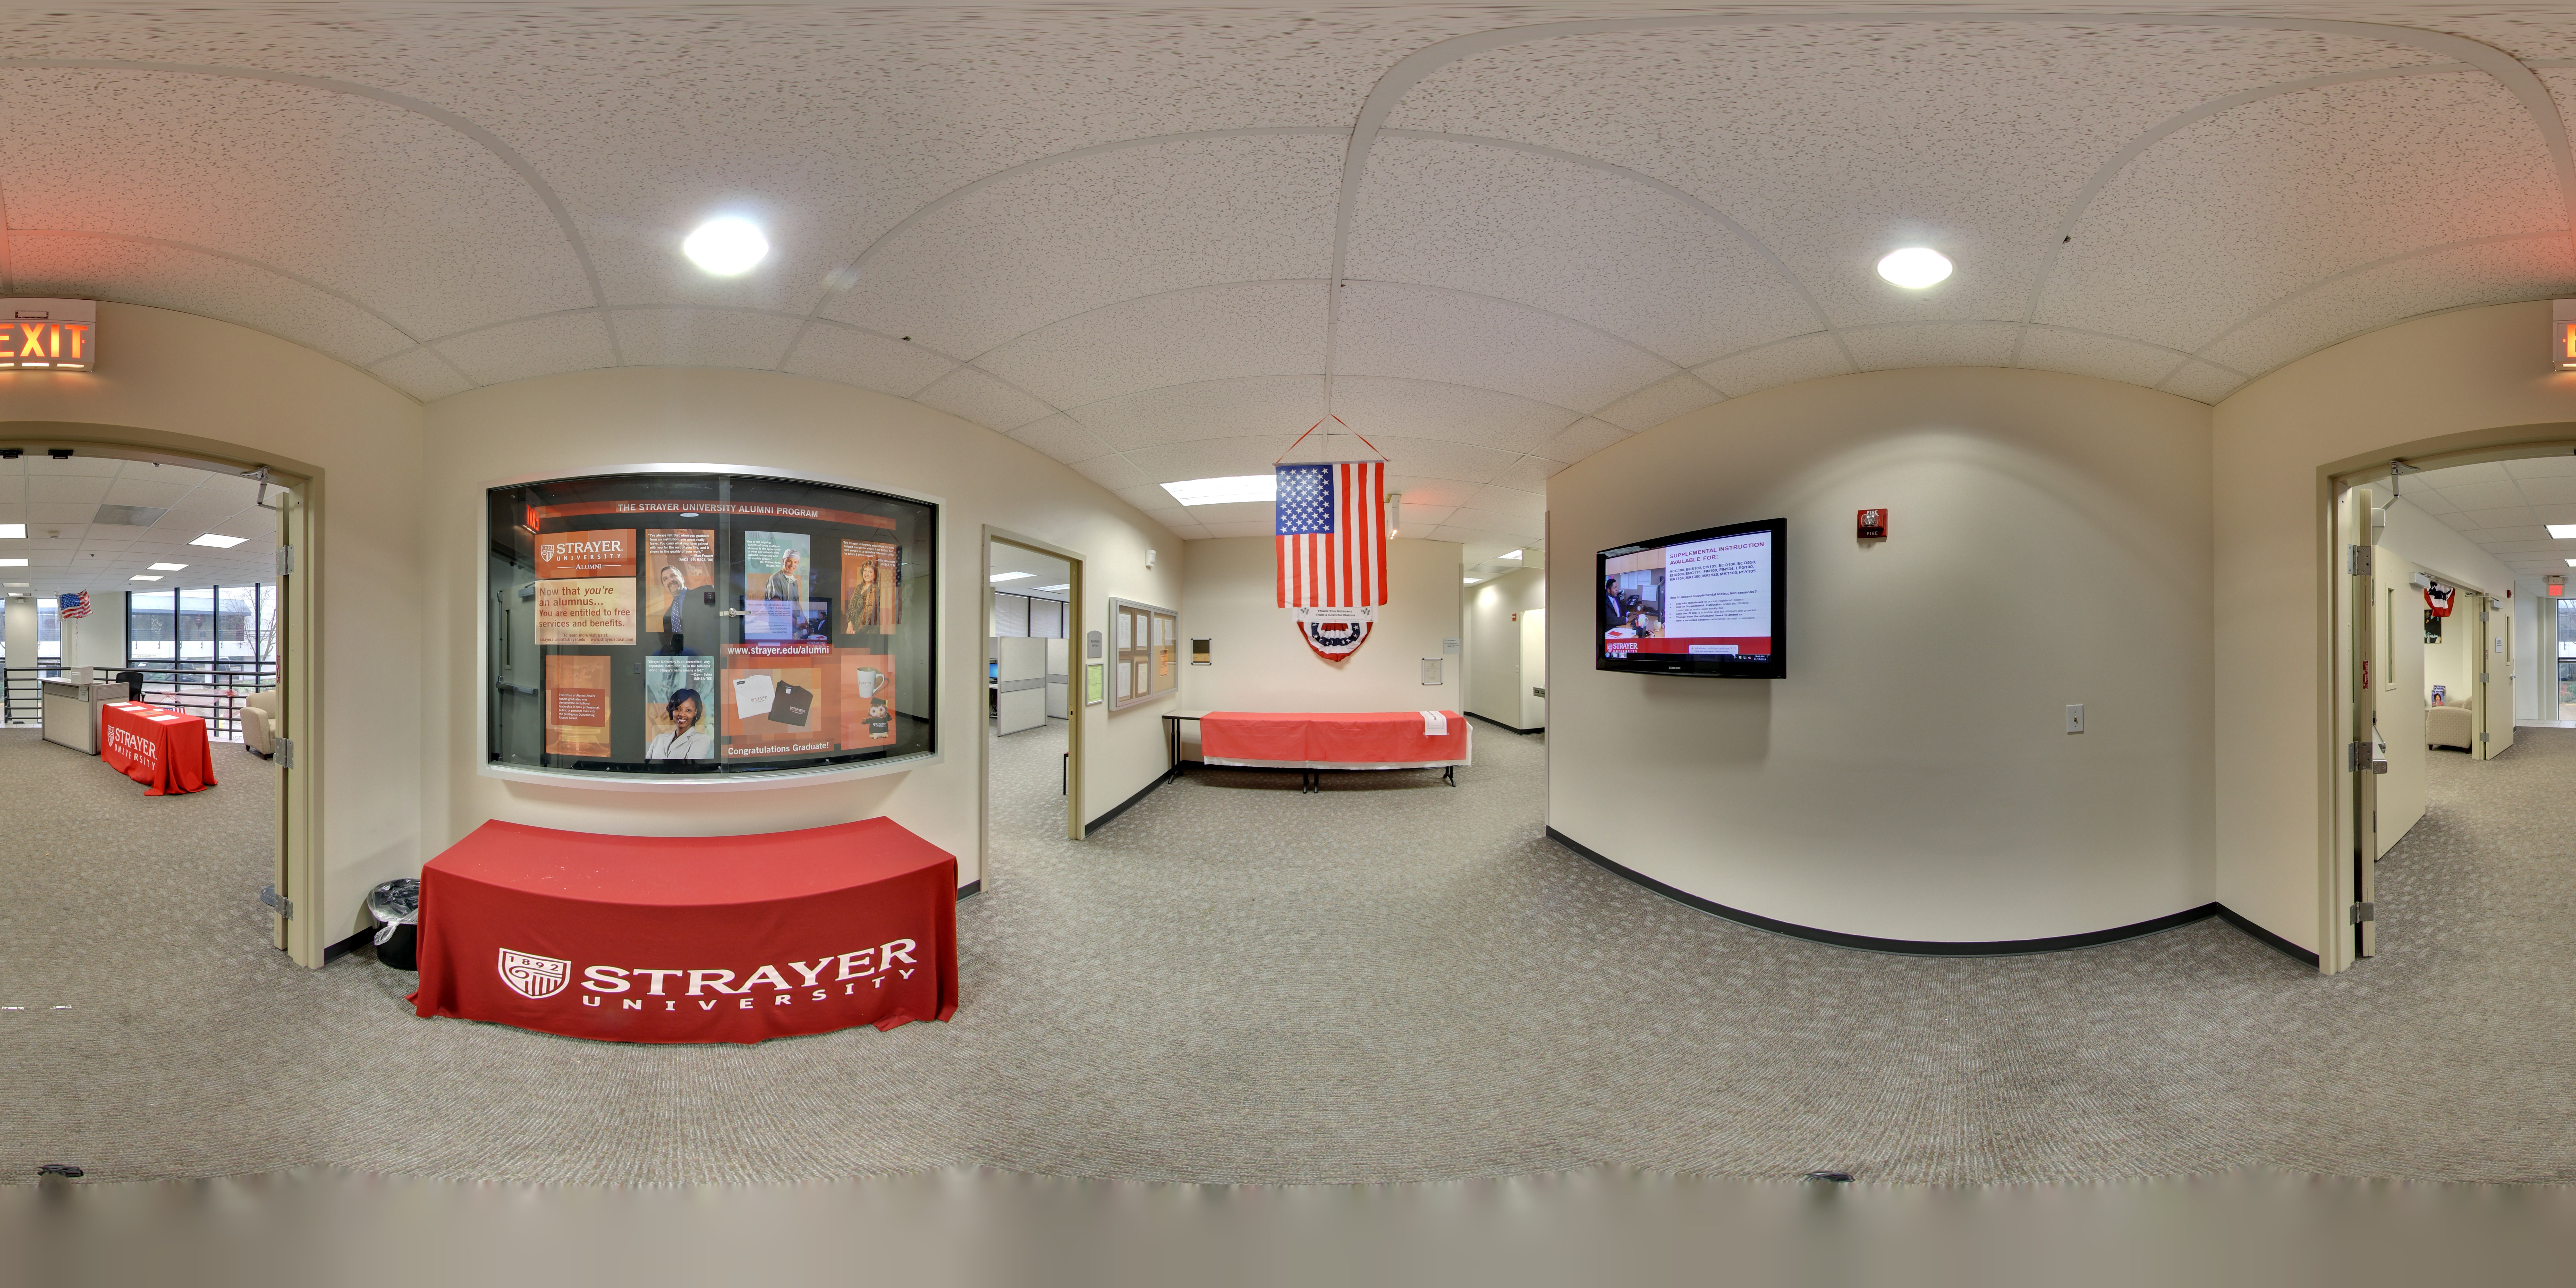 Strayer University image 59